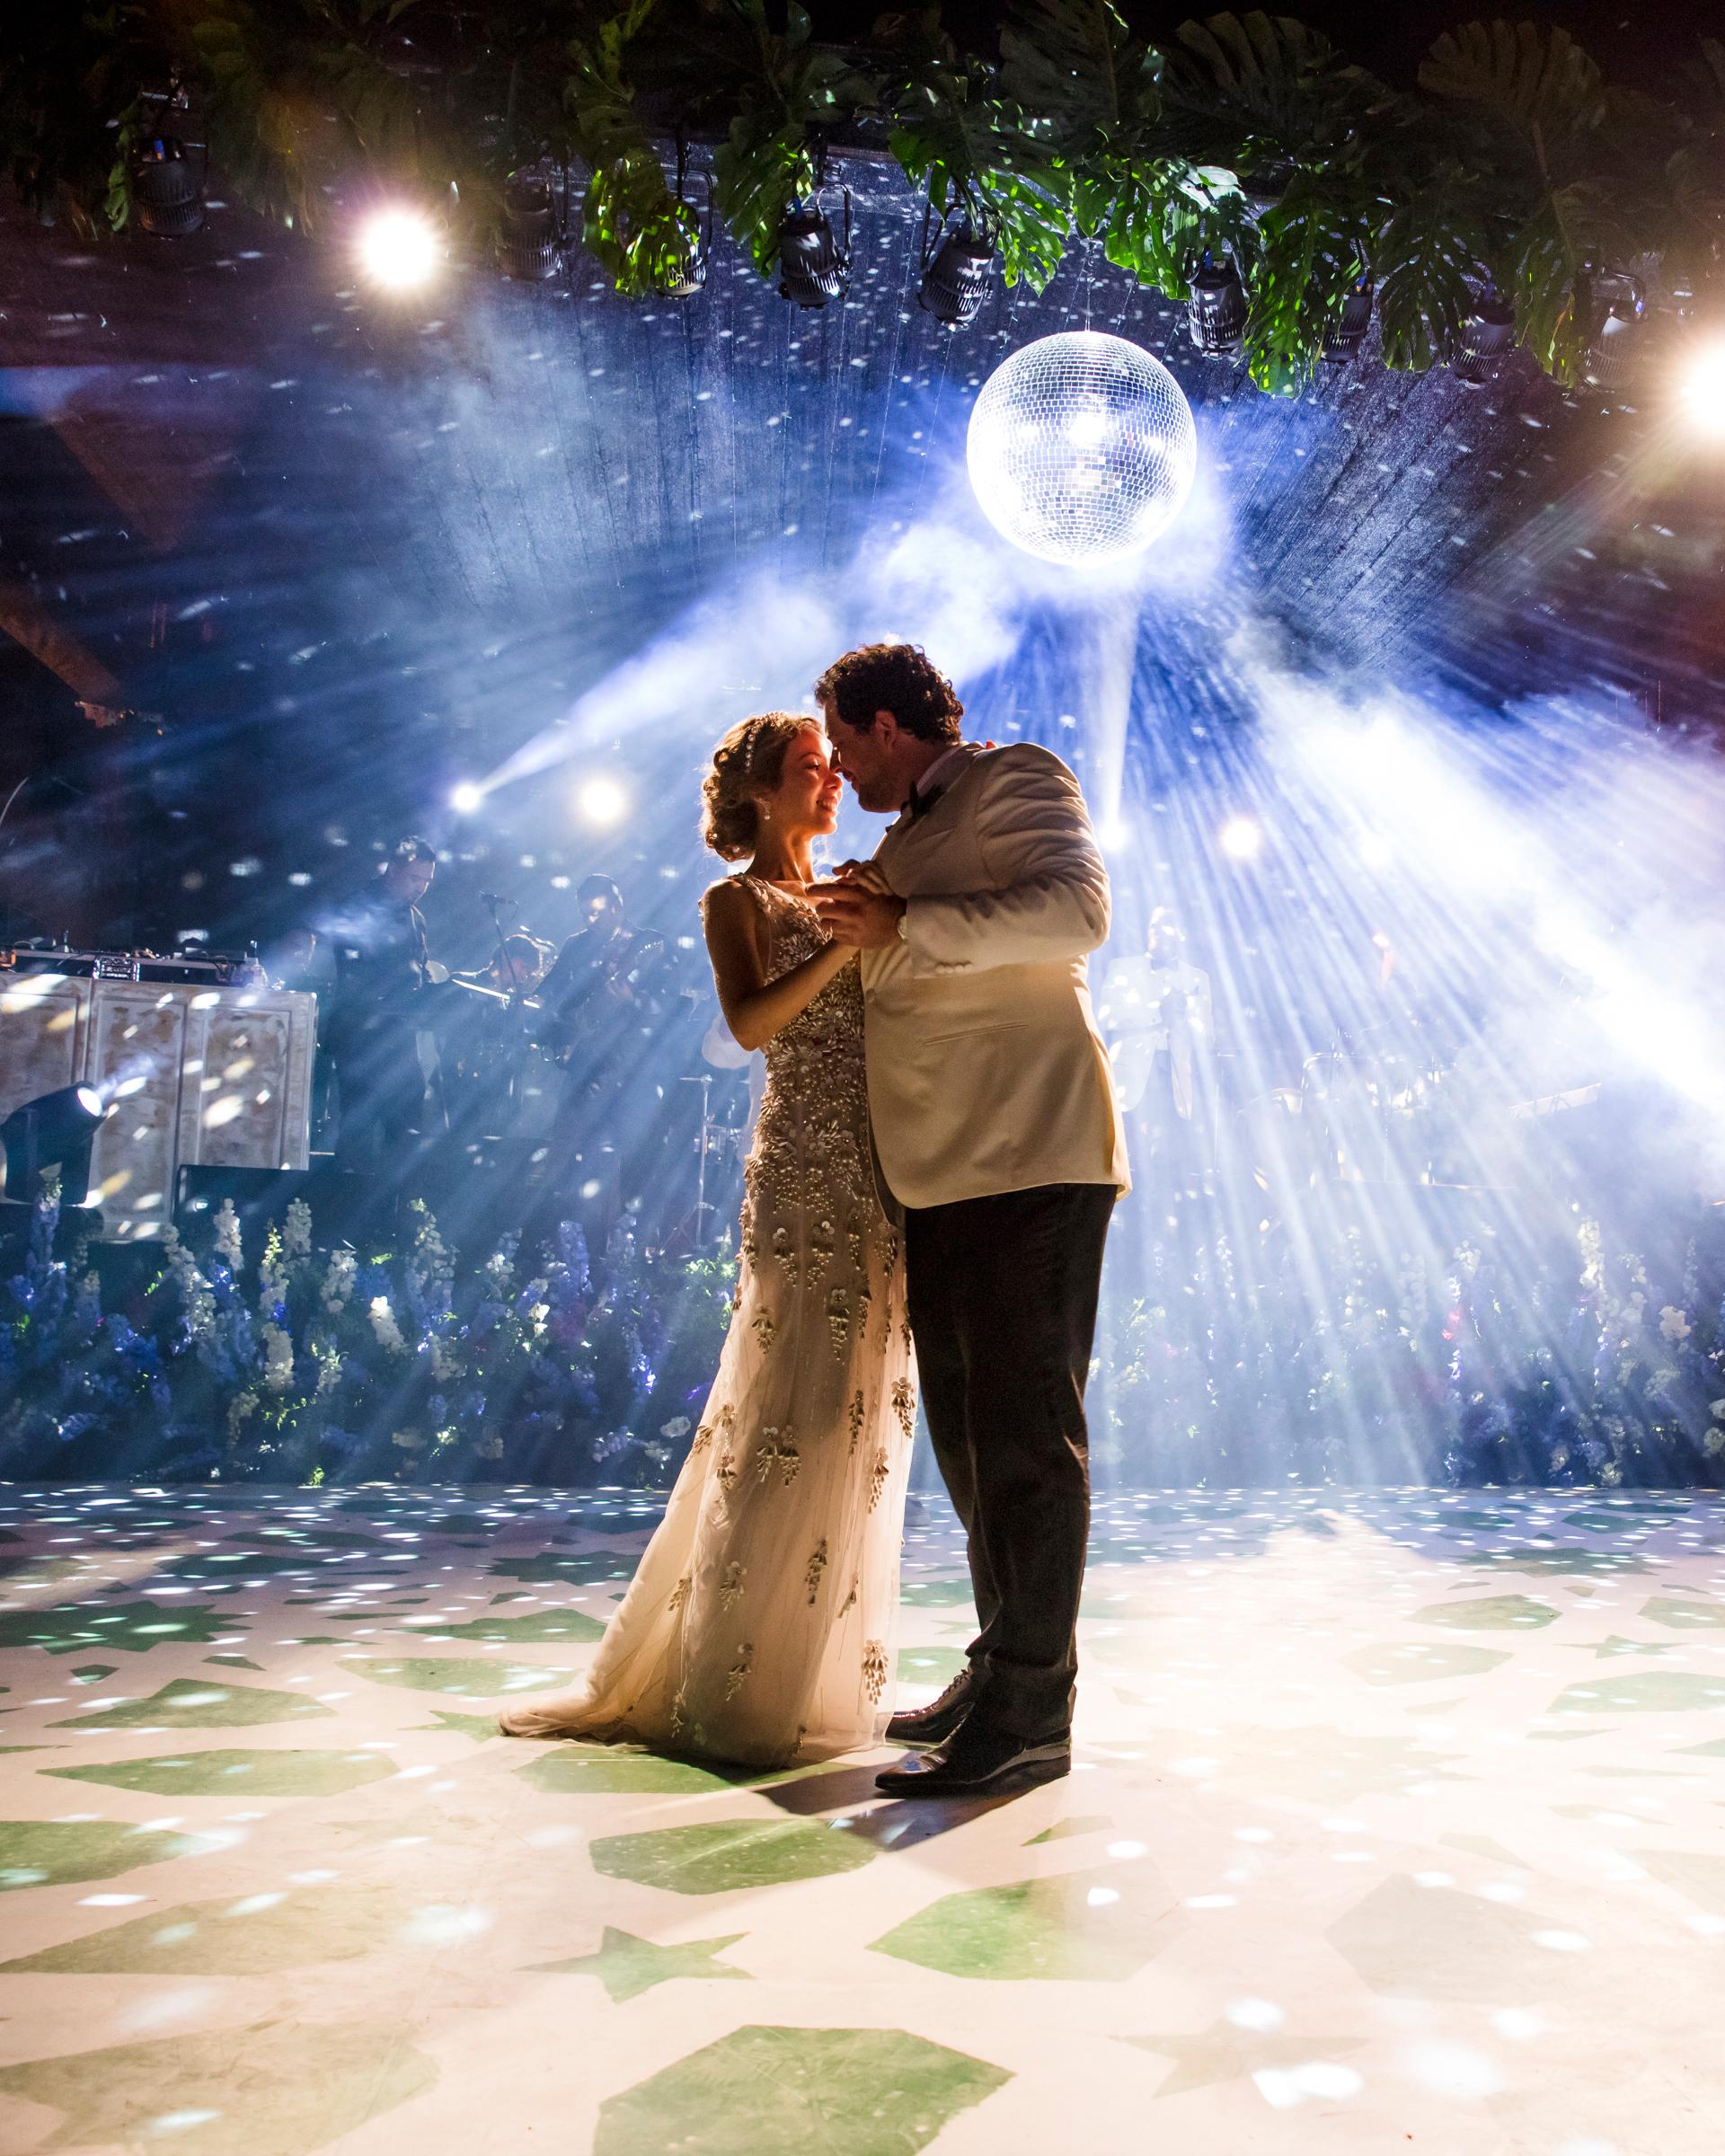 cristina andre wedding first dance